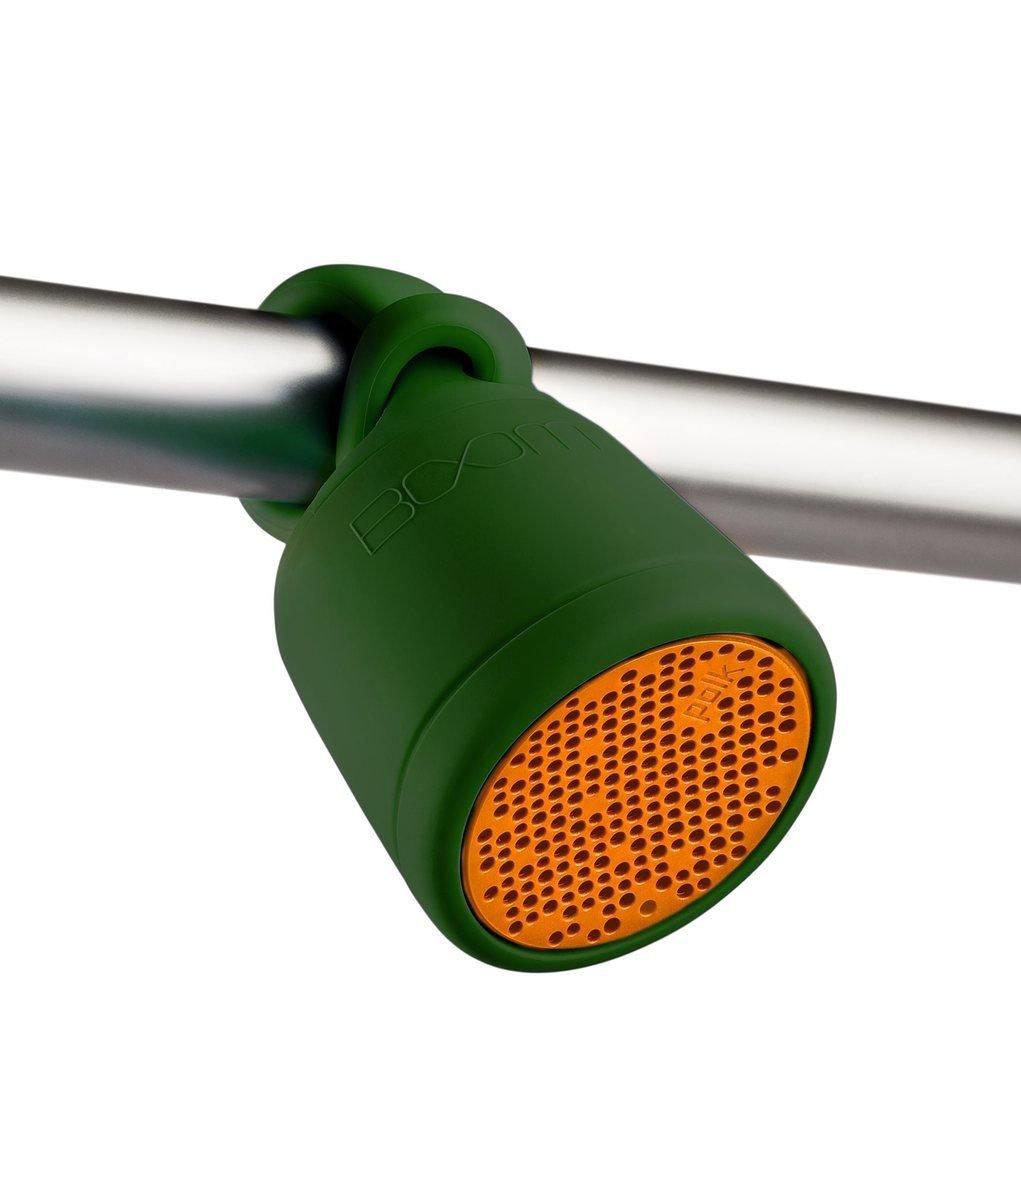 SWIMMER DUO 防水藍牙喇叭, 綠色/橙色